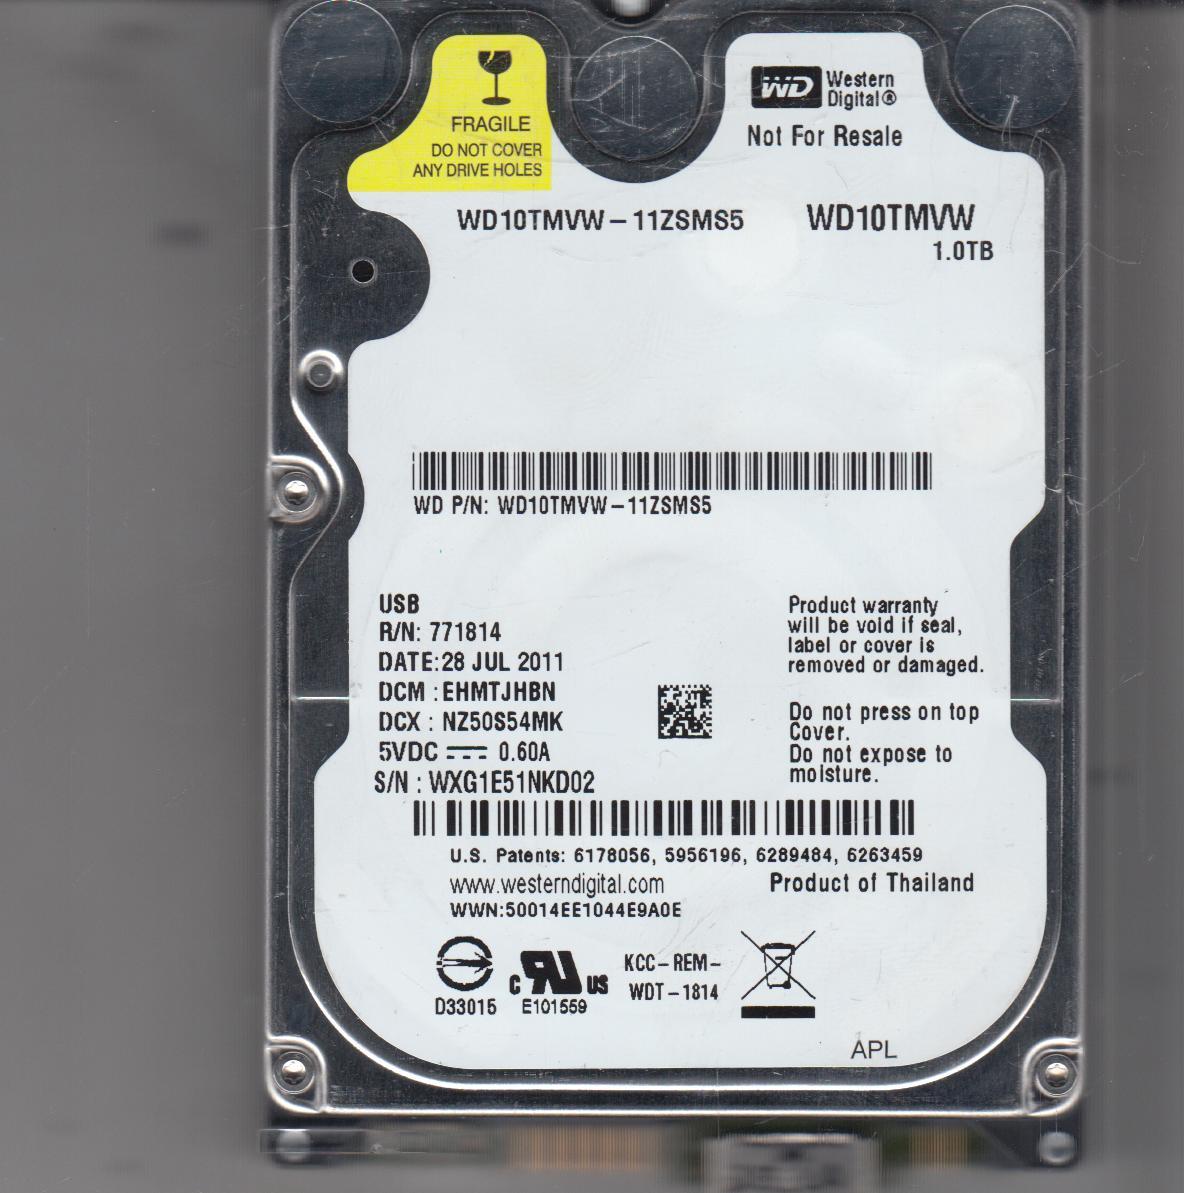 WD10TMVW-11ZSMS5, DCM EHMTJHBN, Western Digital 1TB USB 2.5 Hard Drive